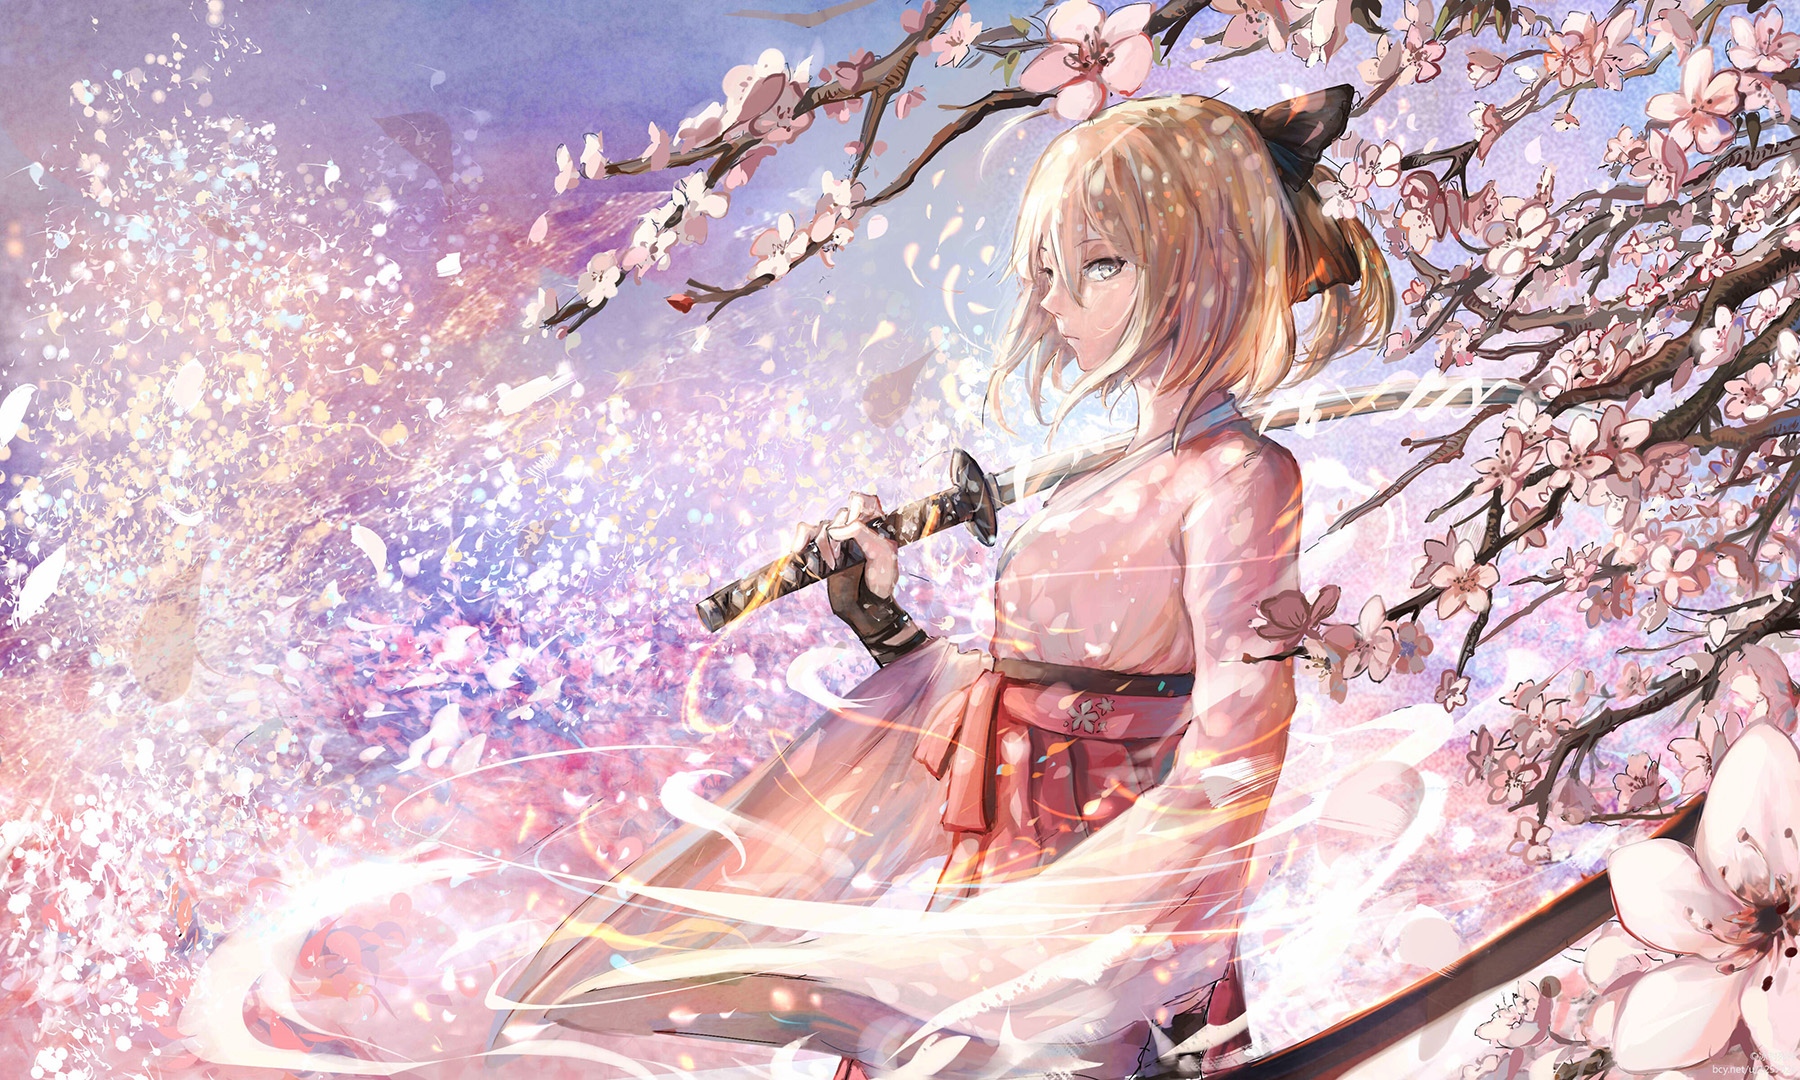 Fate/Grand Order,樱saber,冲田总司,